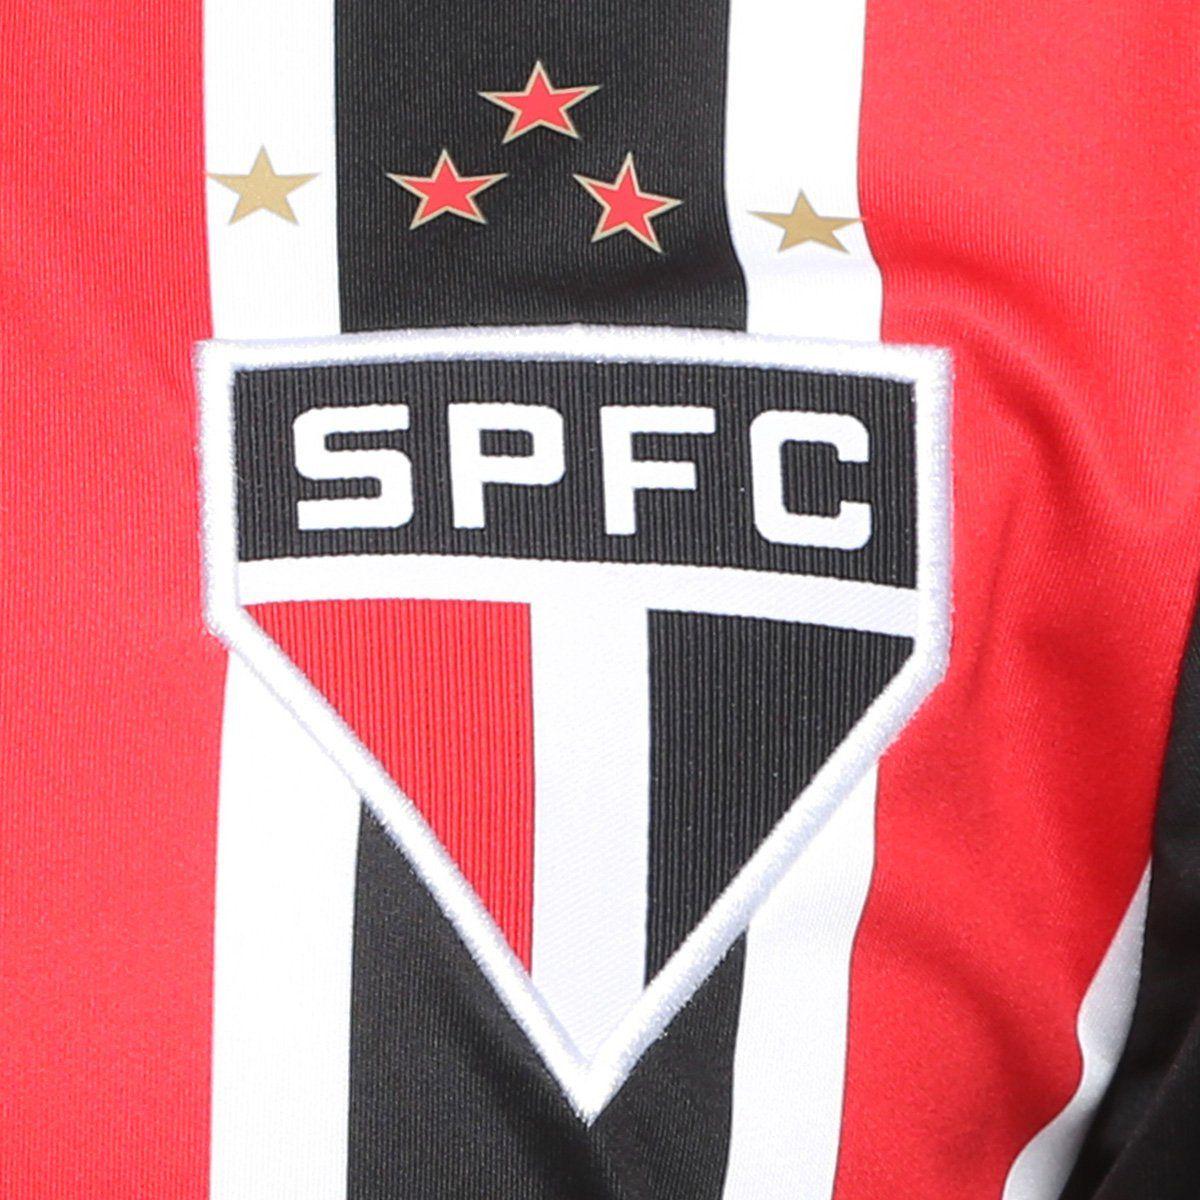 e51a9698f Camisa Masculina Adidas São Paulo II 2018 s n° Torcedor - BRACIA ...